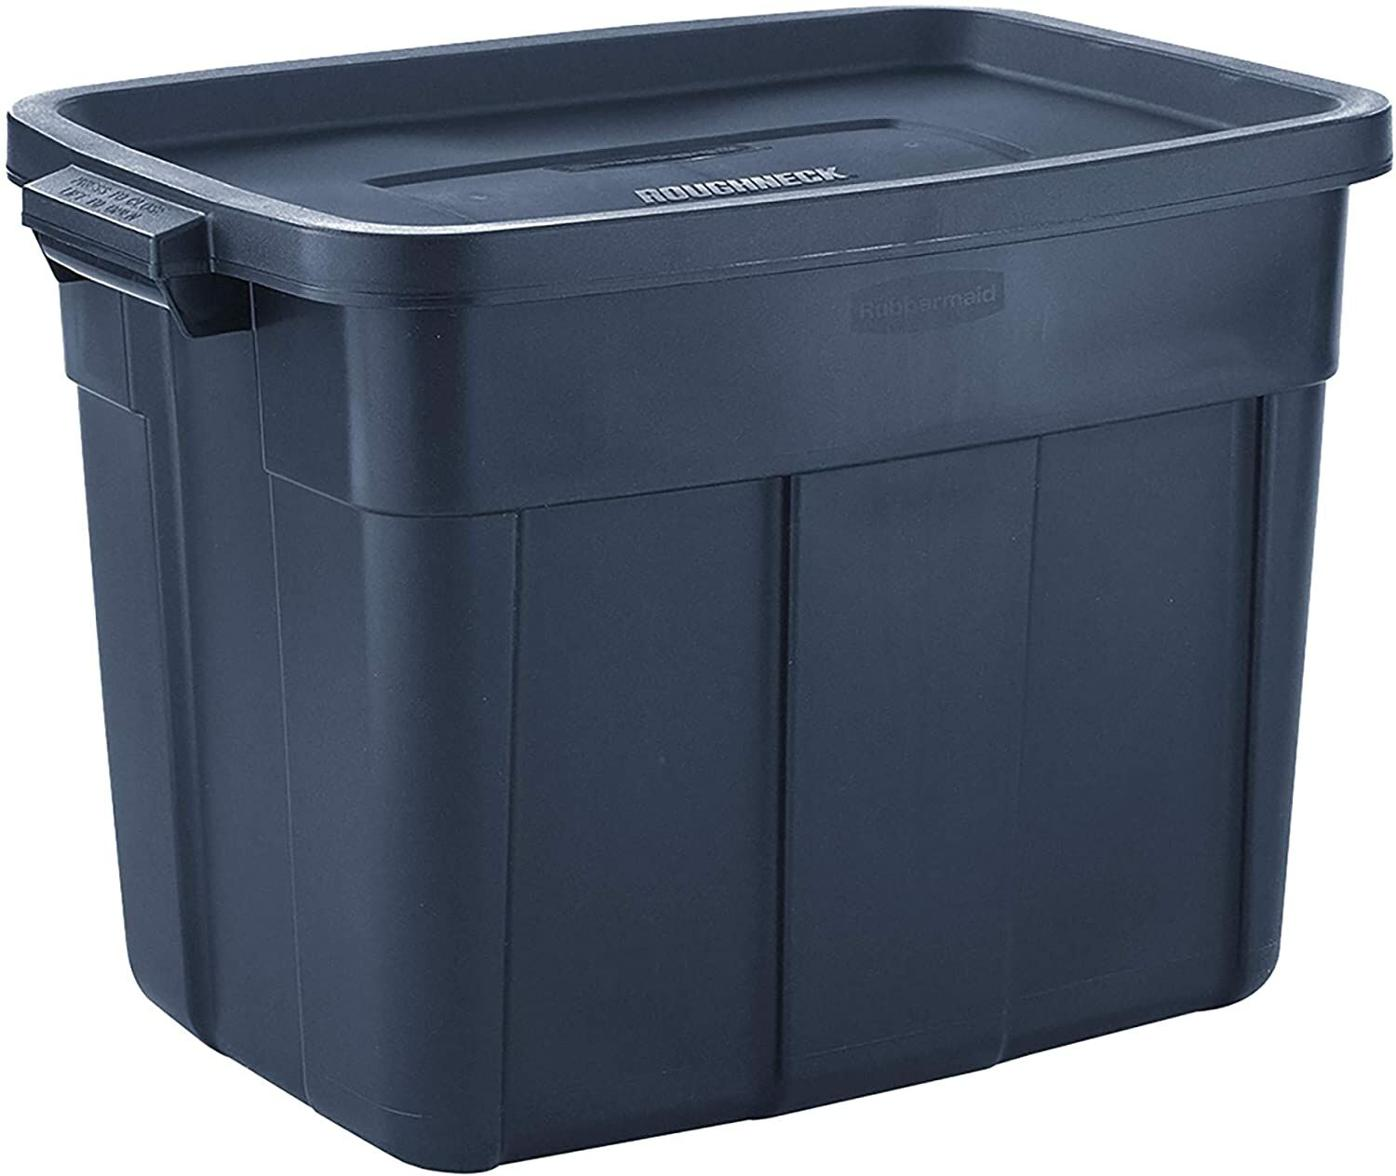 plastic tub for storage